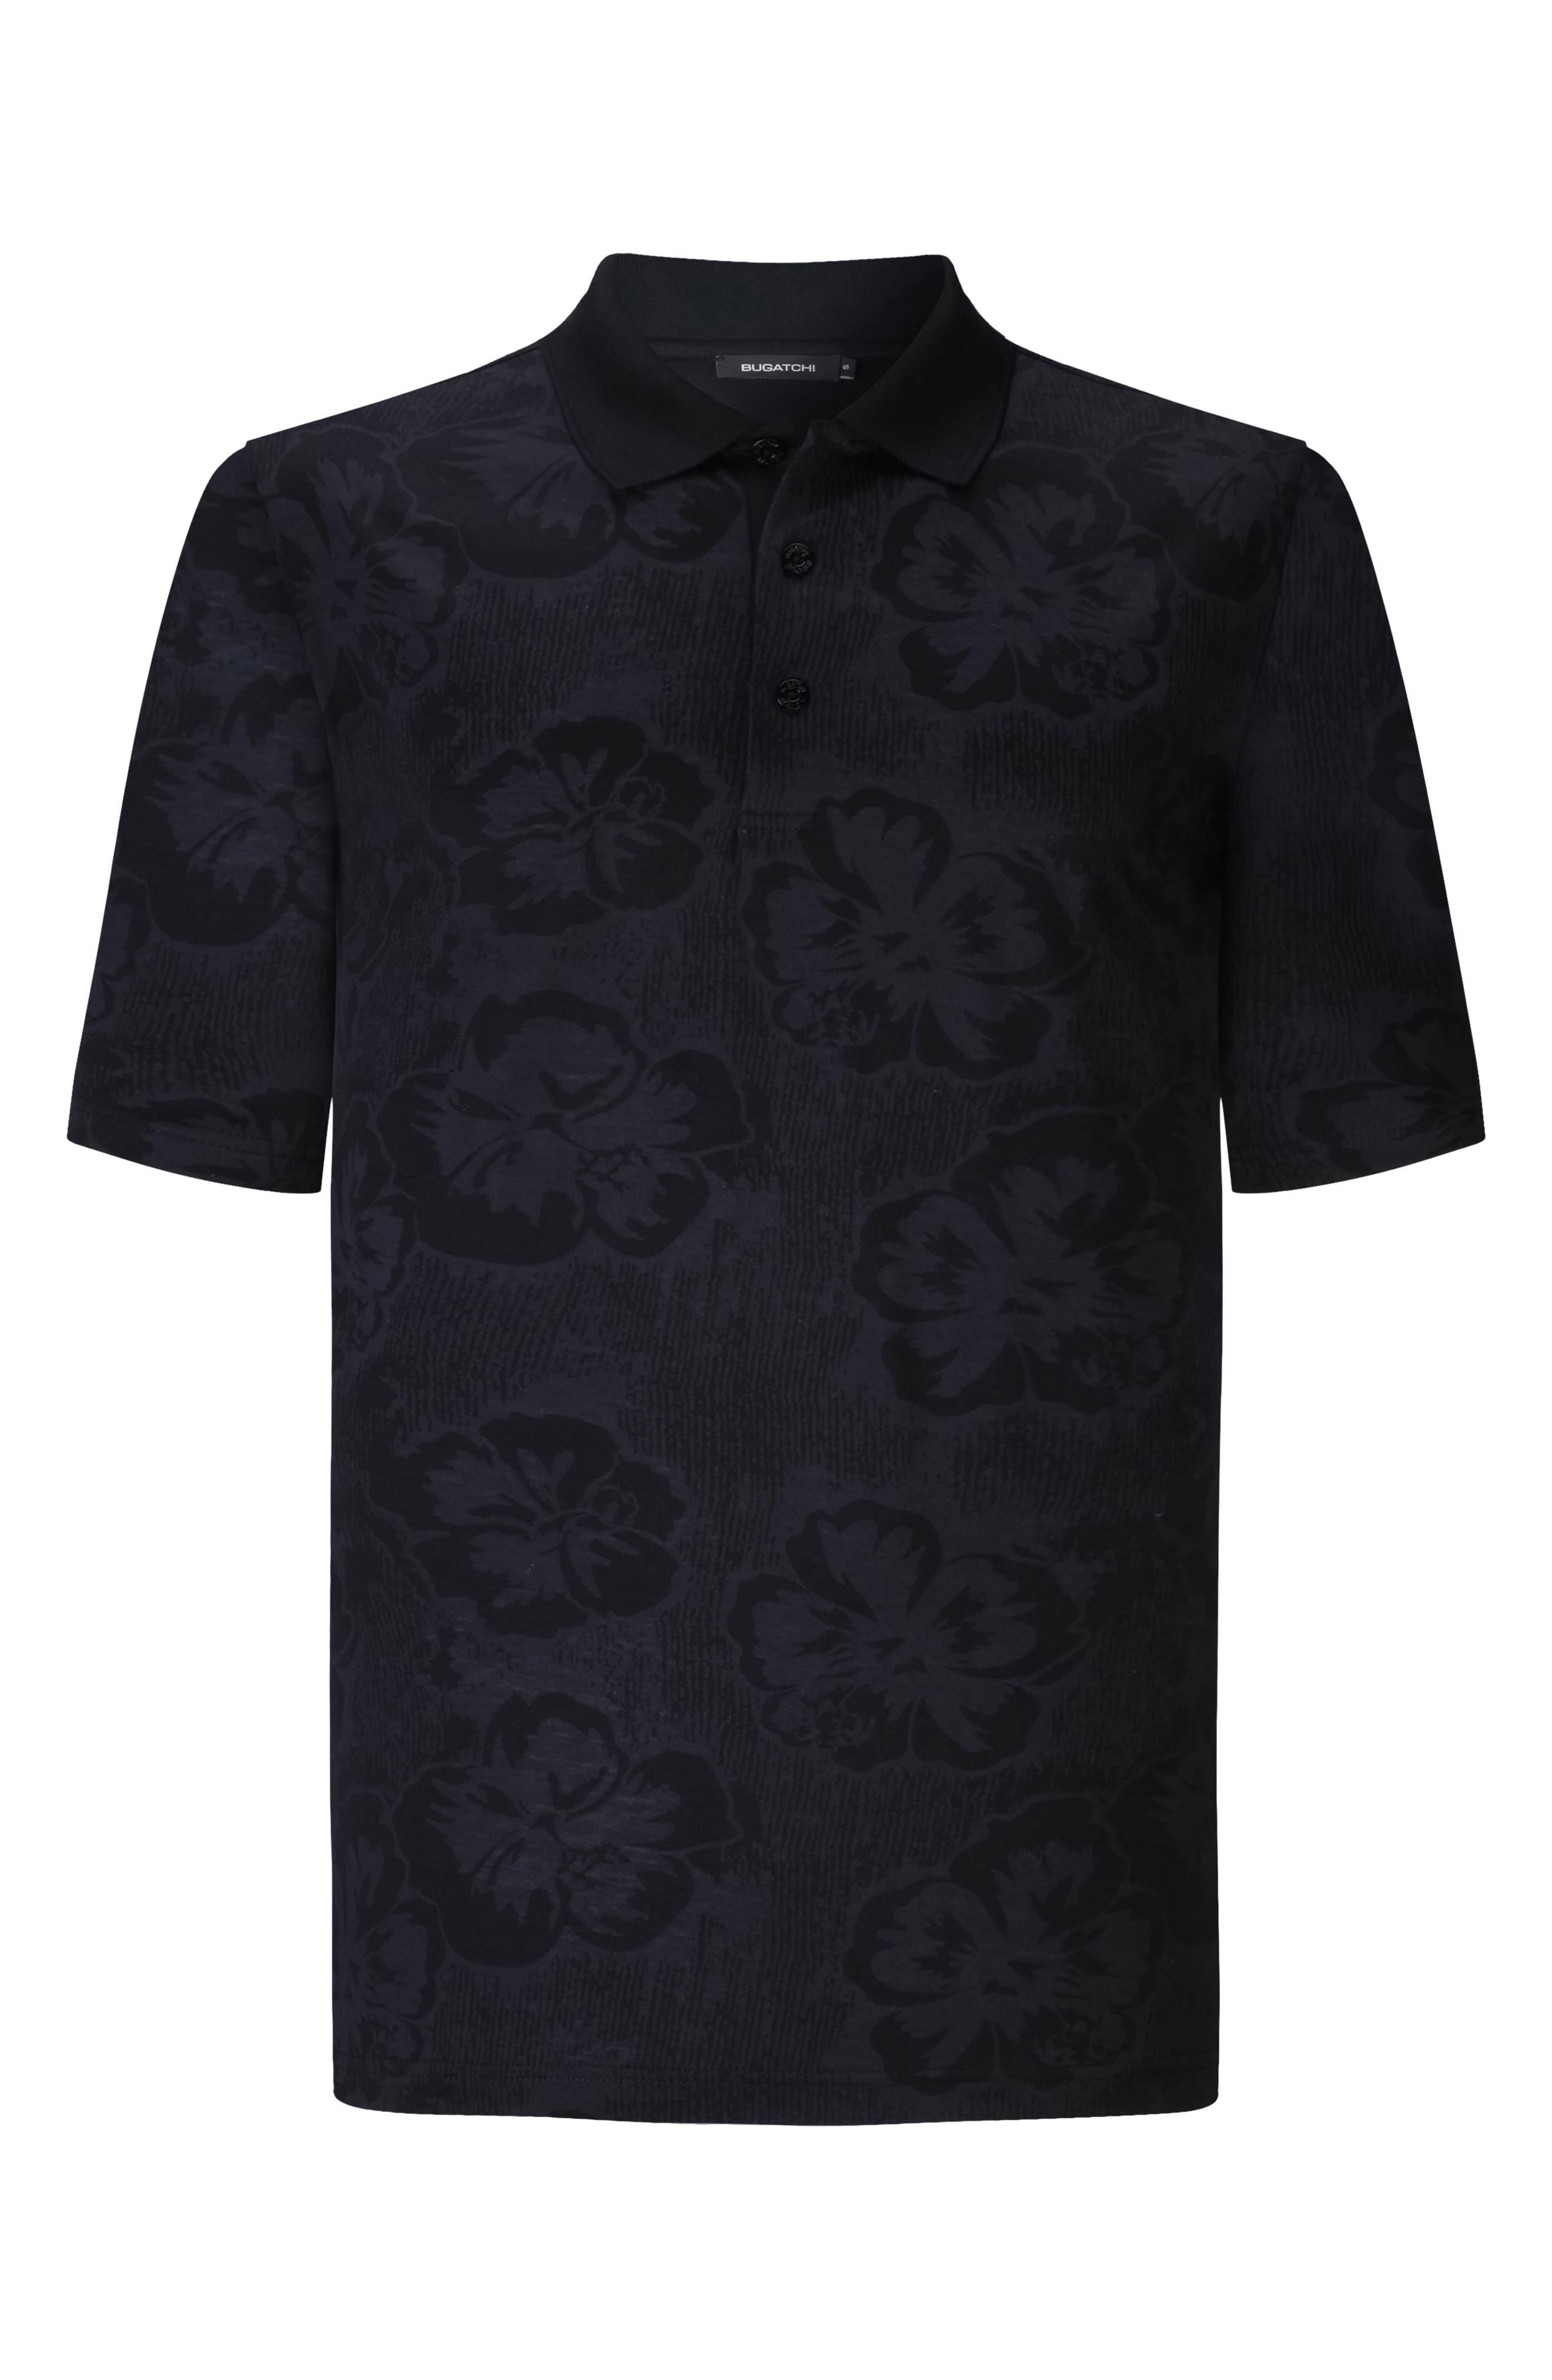 Marine//White French Connection Mercerised Tipped Polo Shirt